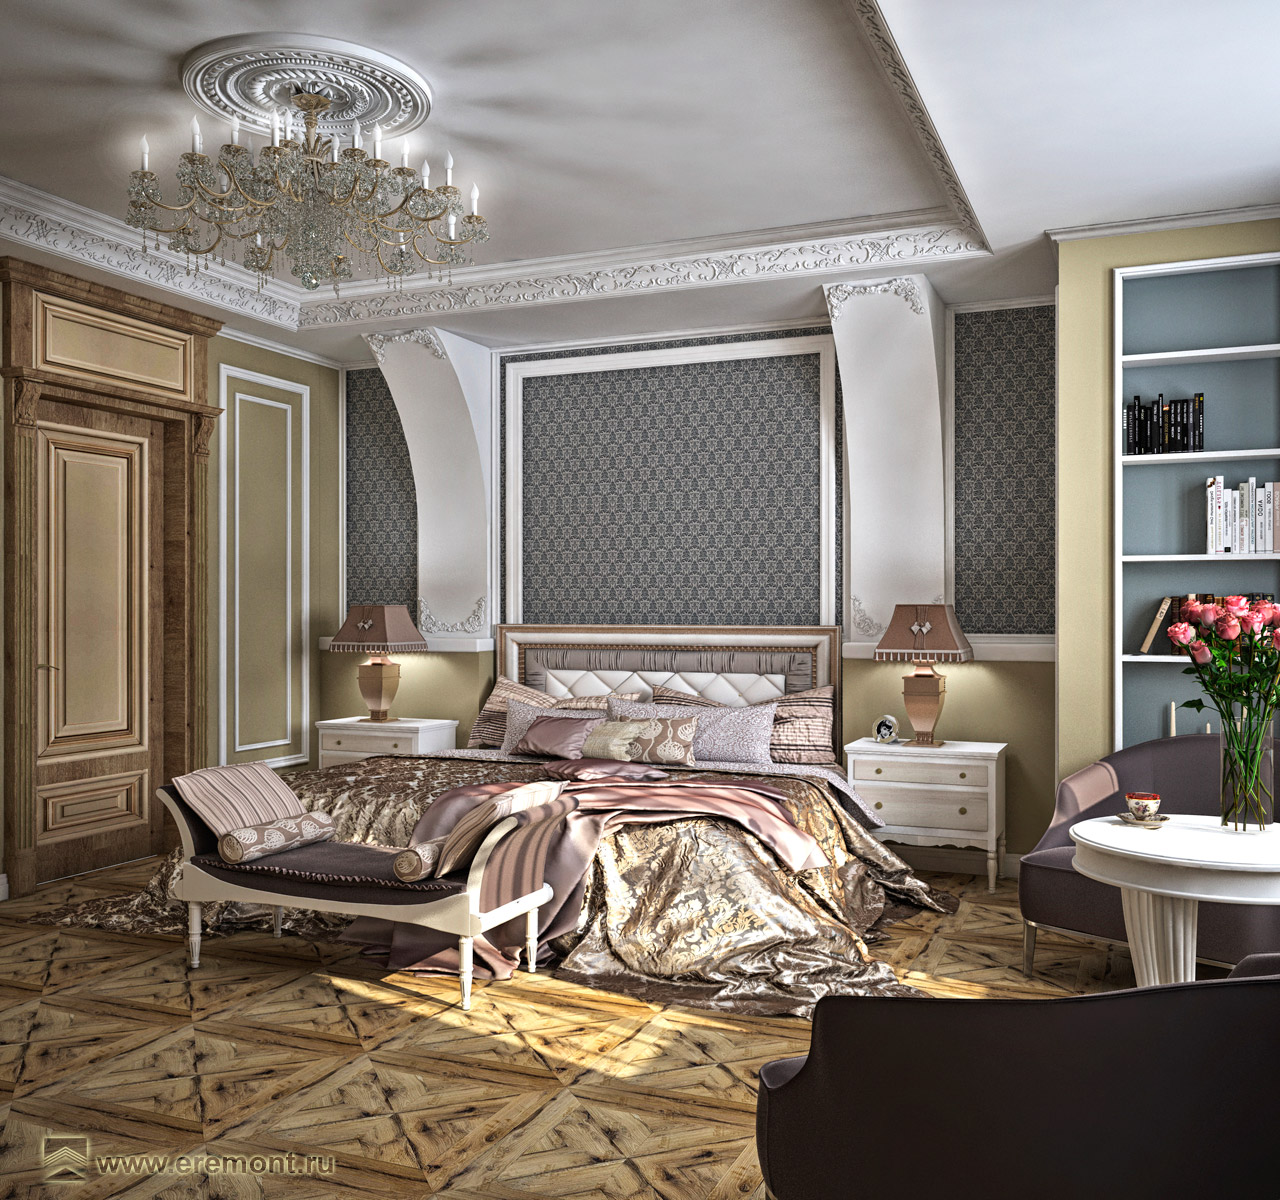 https://www.eremont.ru/upload/iblock/a14/5_bolshavya_spalnya_2et.jpg